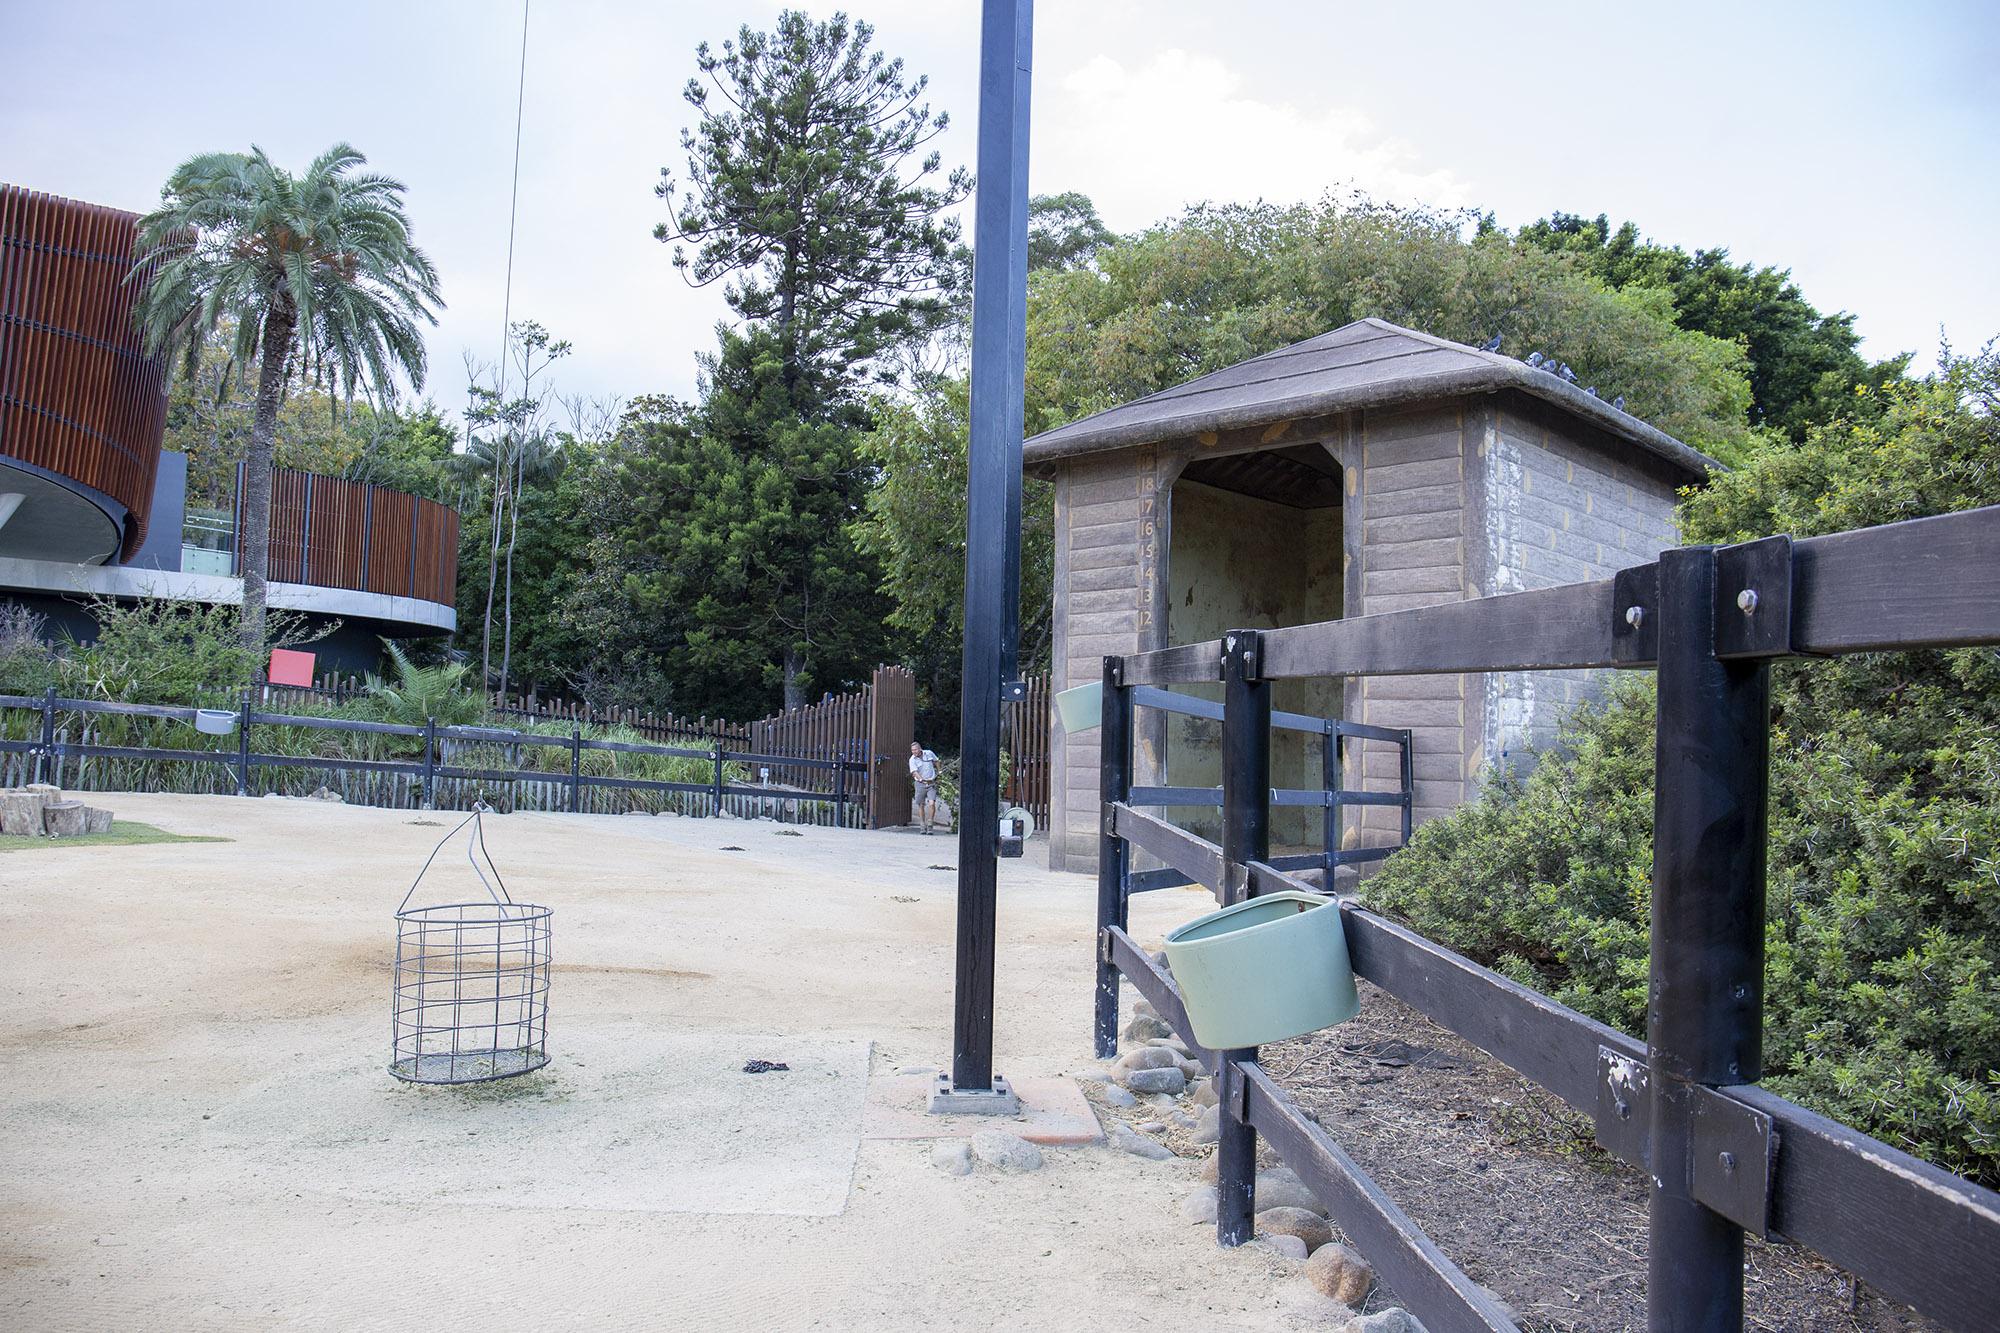 Taronga Zoo, Giraffe Enclosure